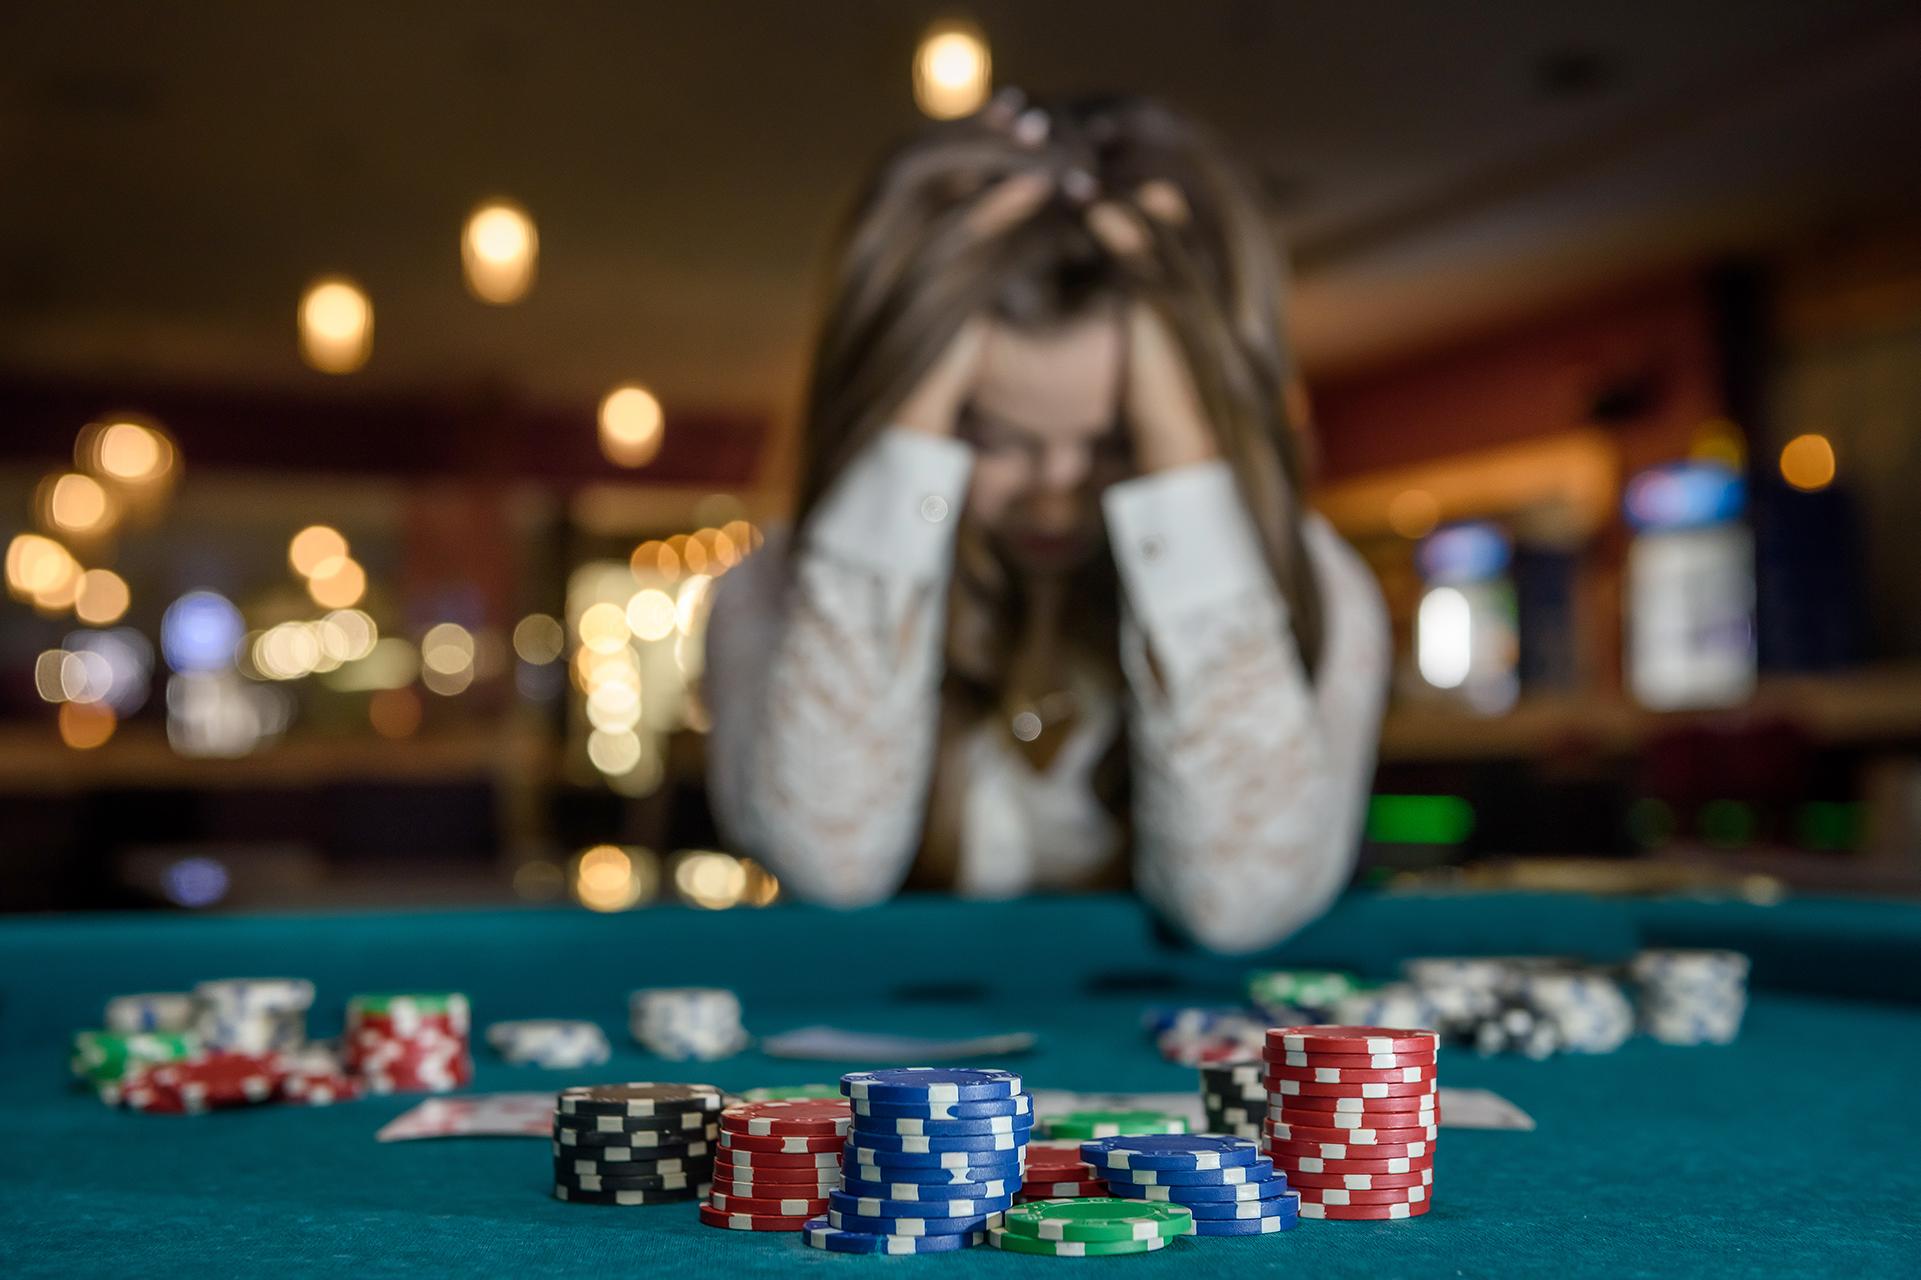 4 in 1 casino games